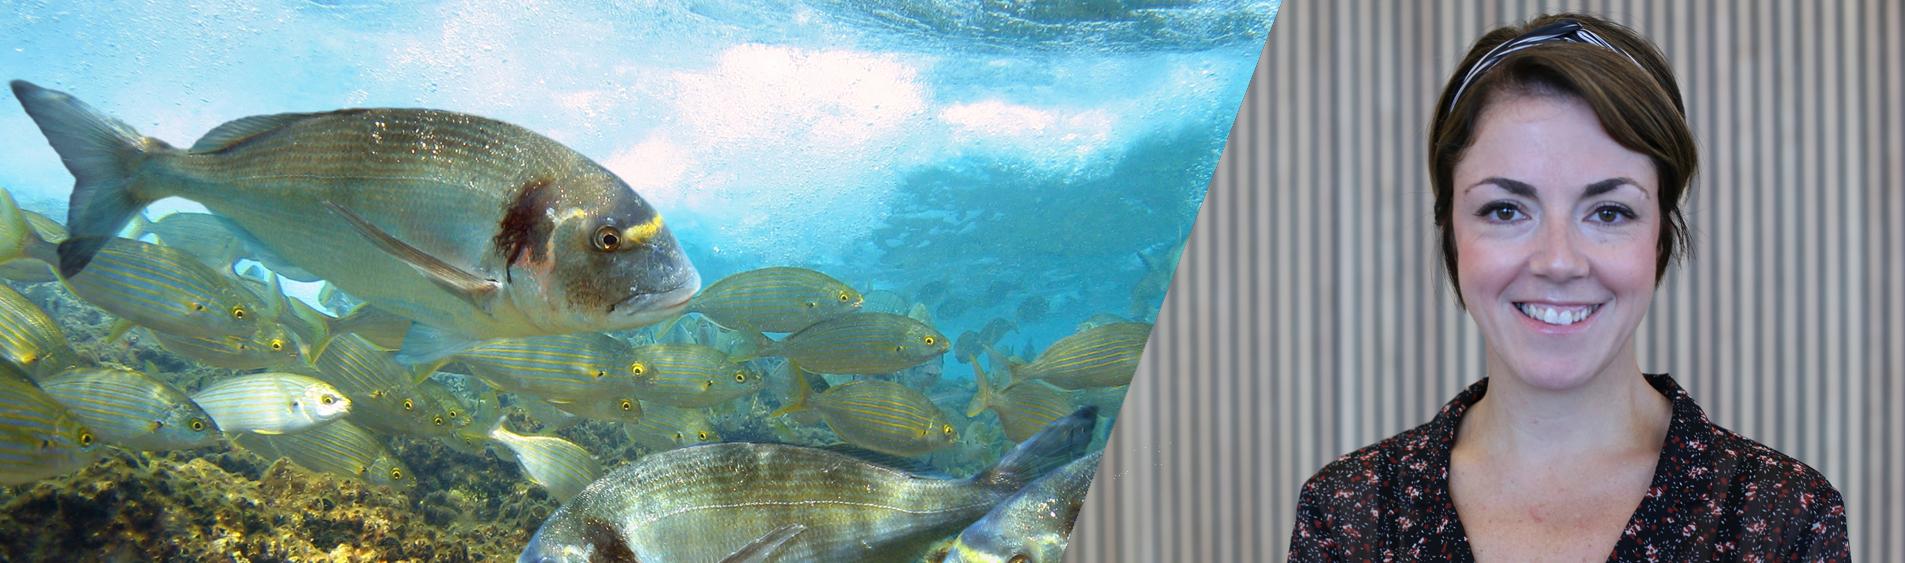 seabream krill science